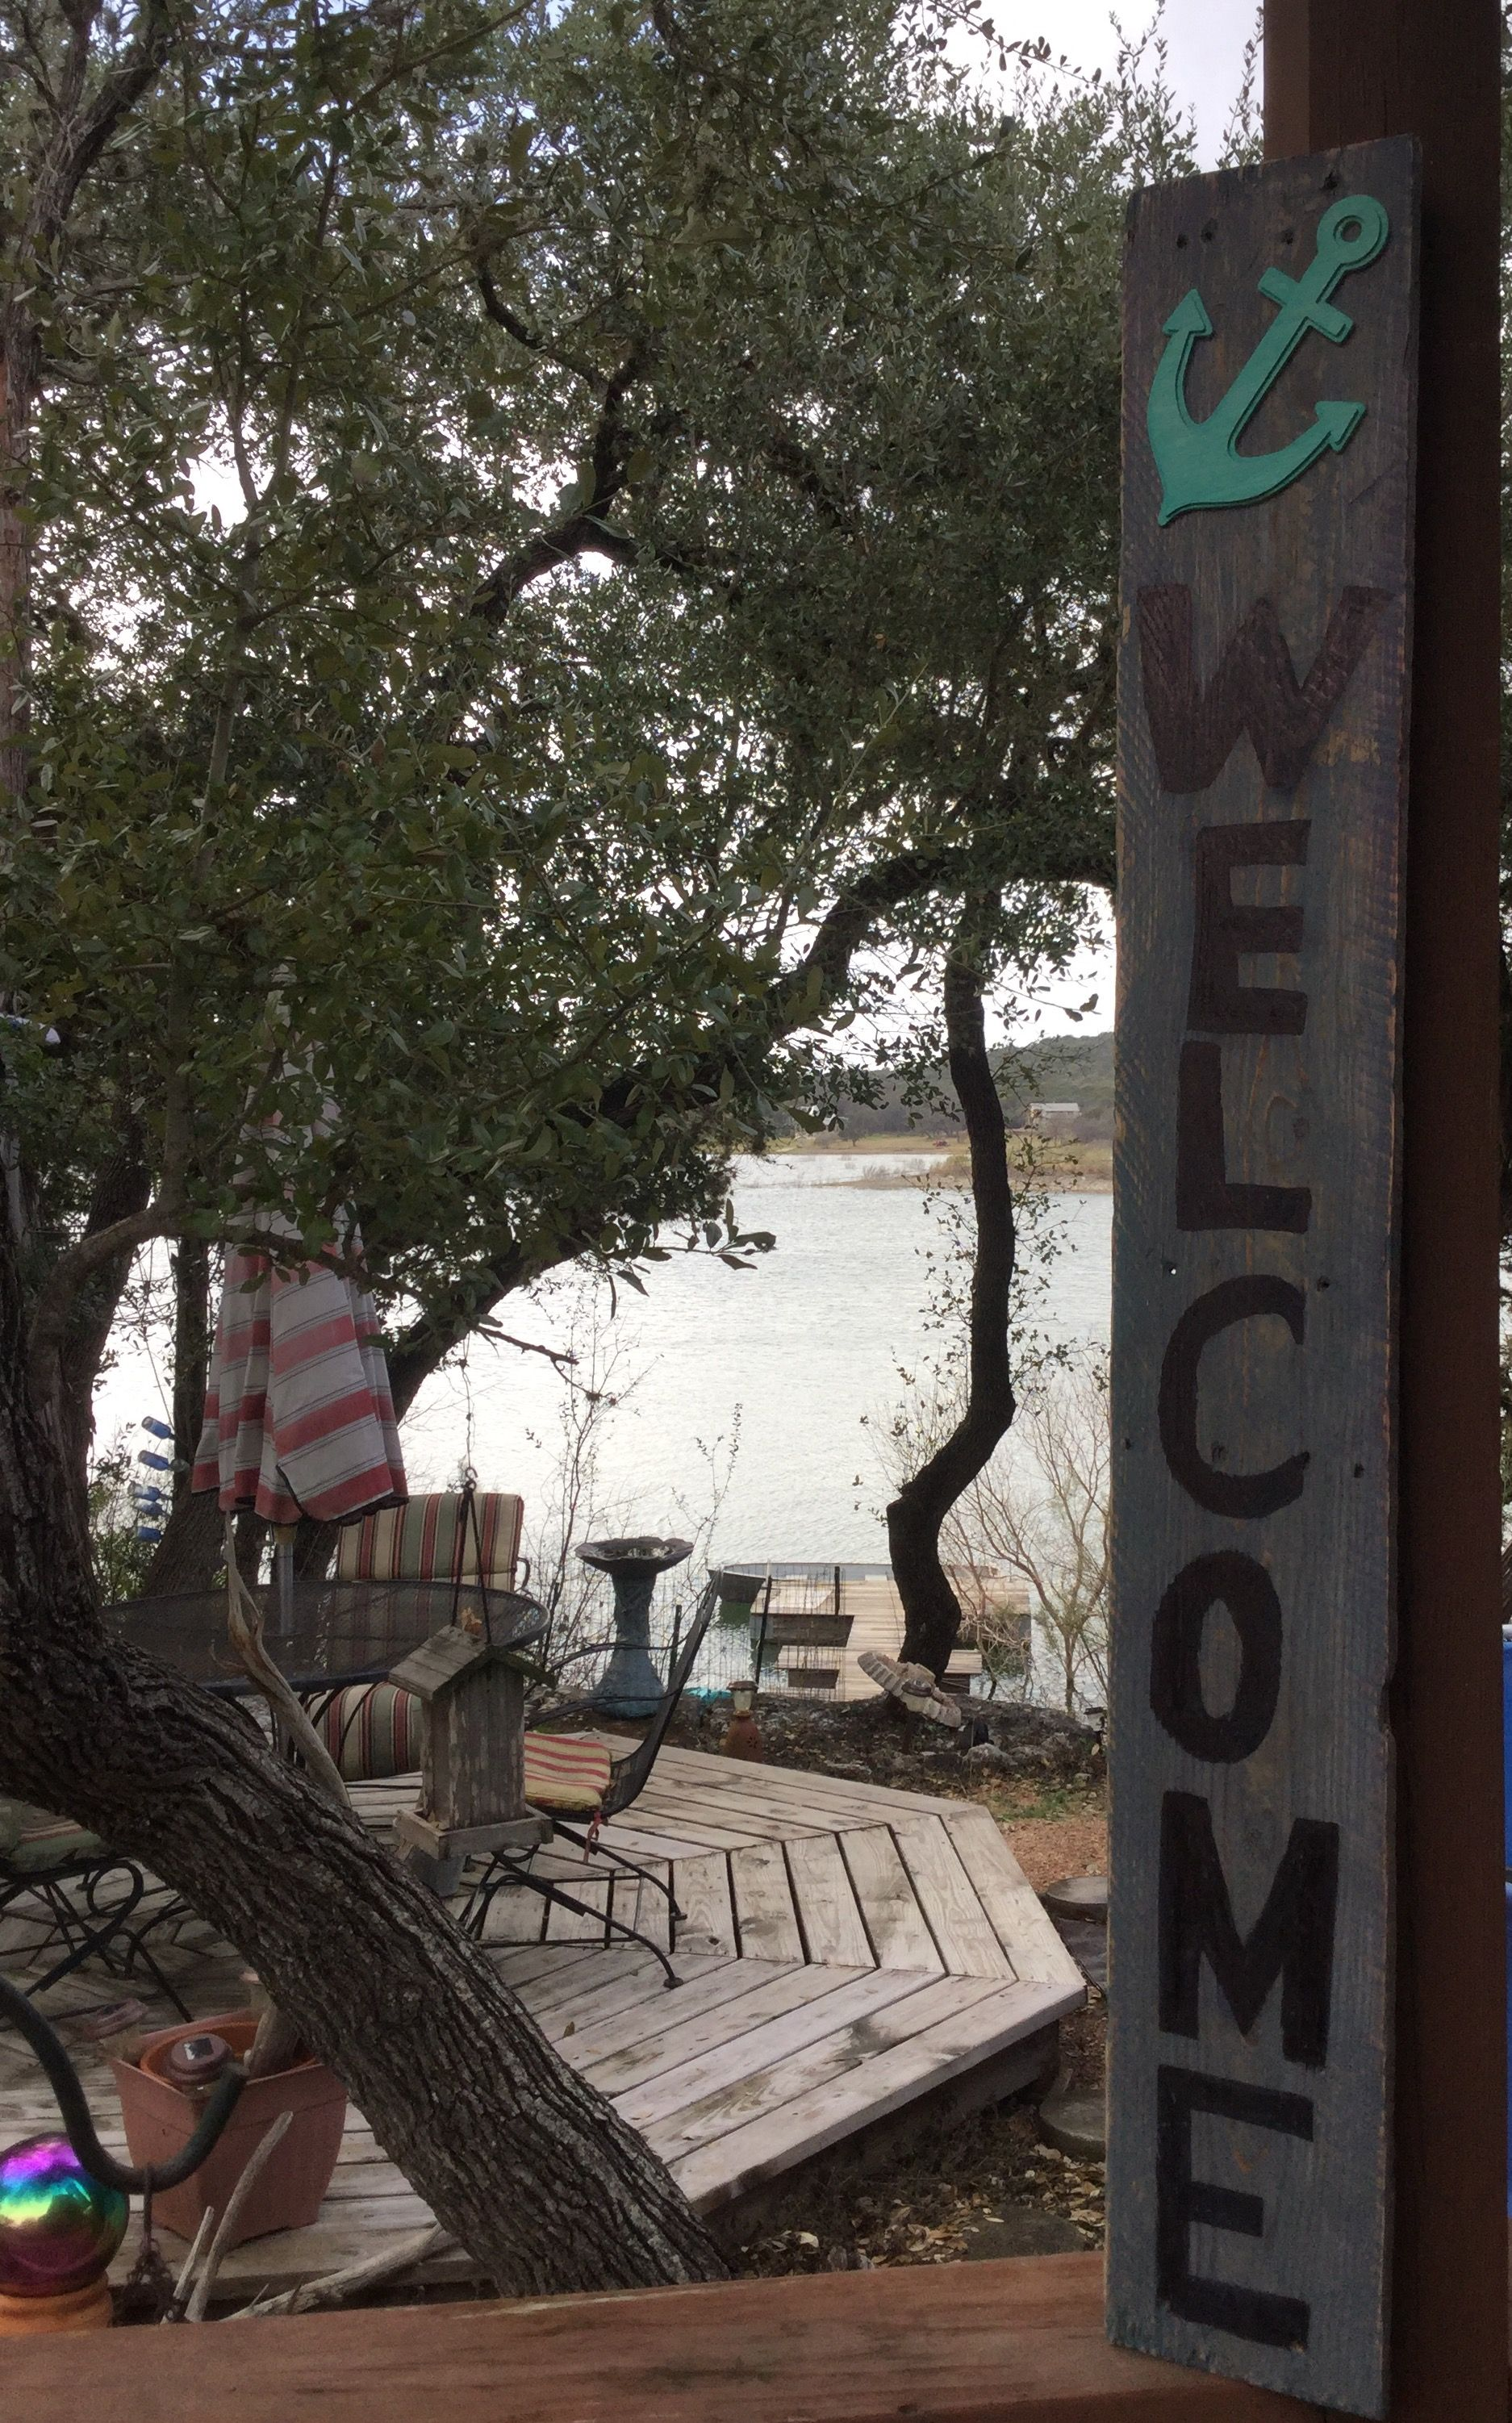 Welcome to my backyard ?! | Lake living, Lake life, Backyard on My Garden Outdoor Living  id=13213